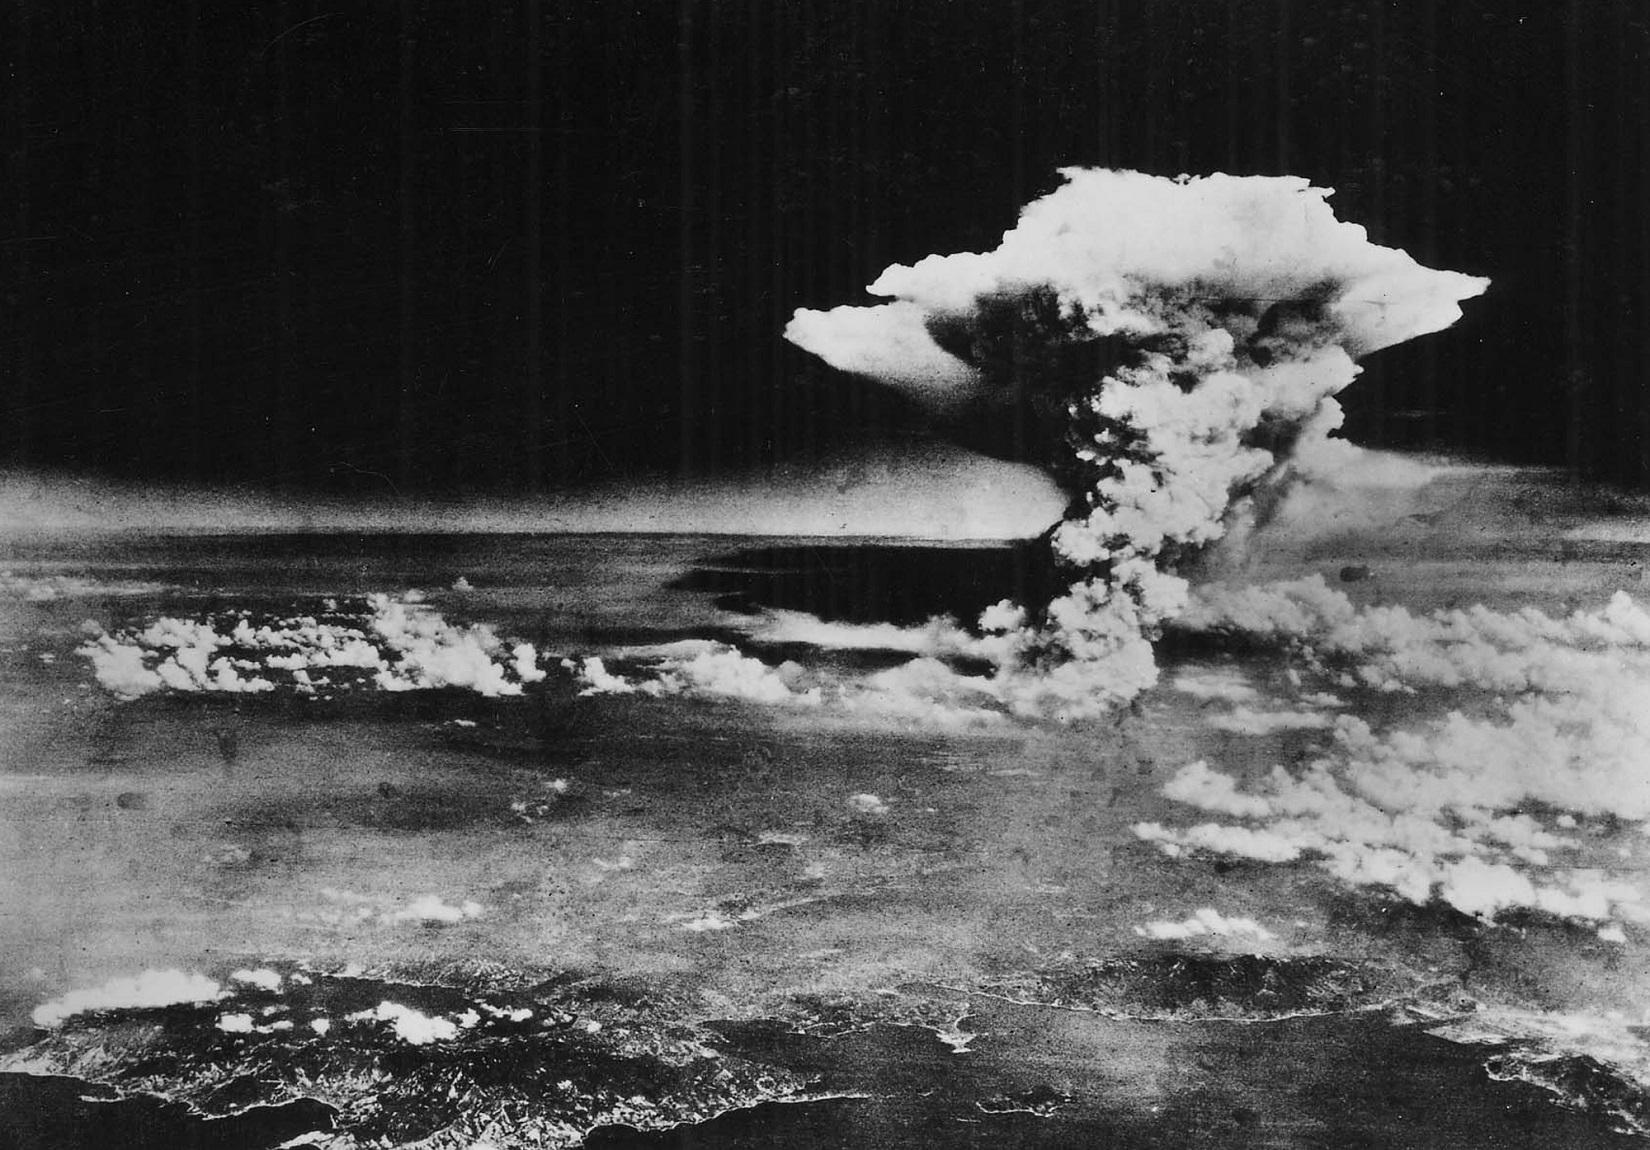 The Man Who Survived the Atomic Bombings of BOTH Hiroshima and Nagasaki